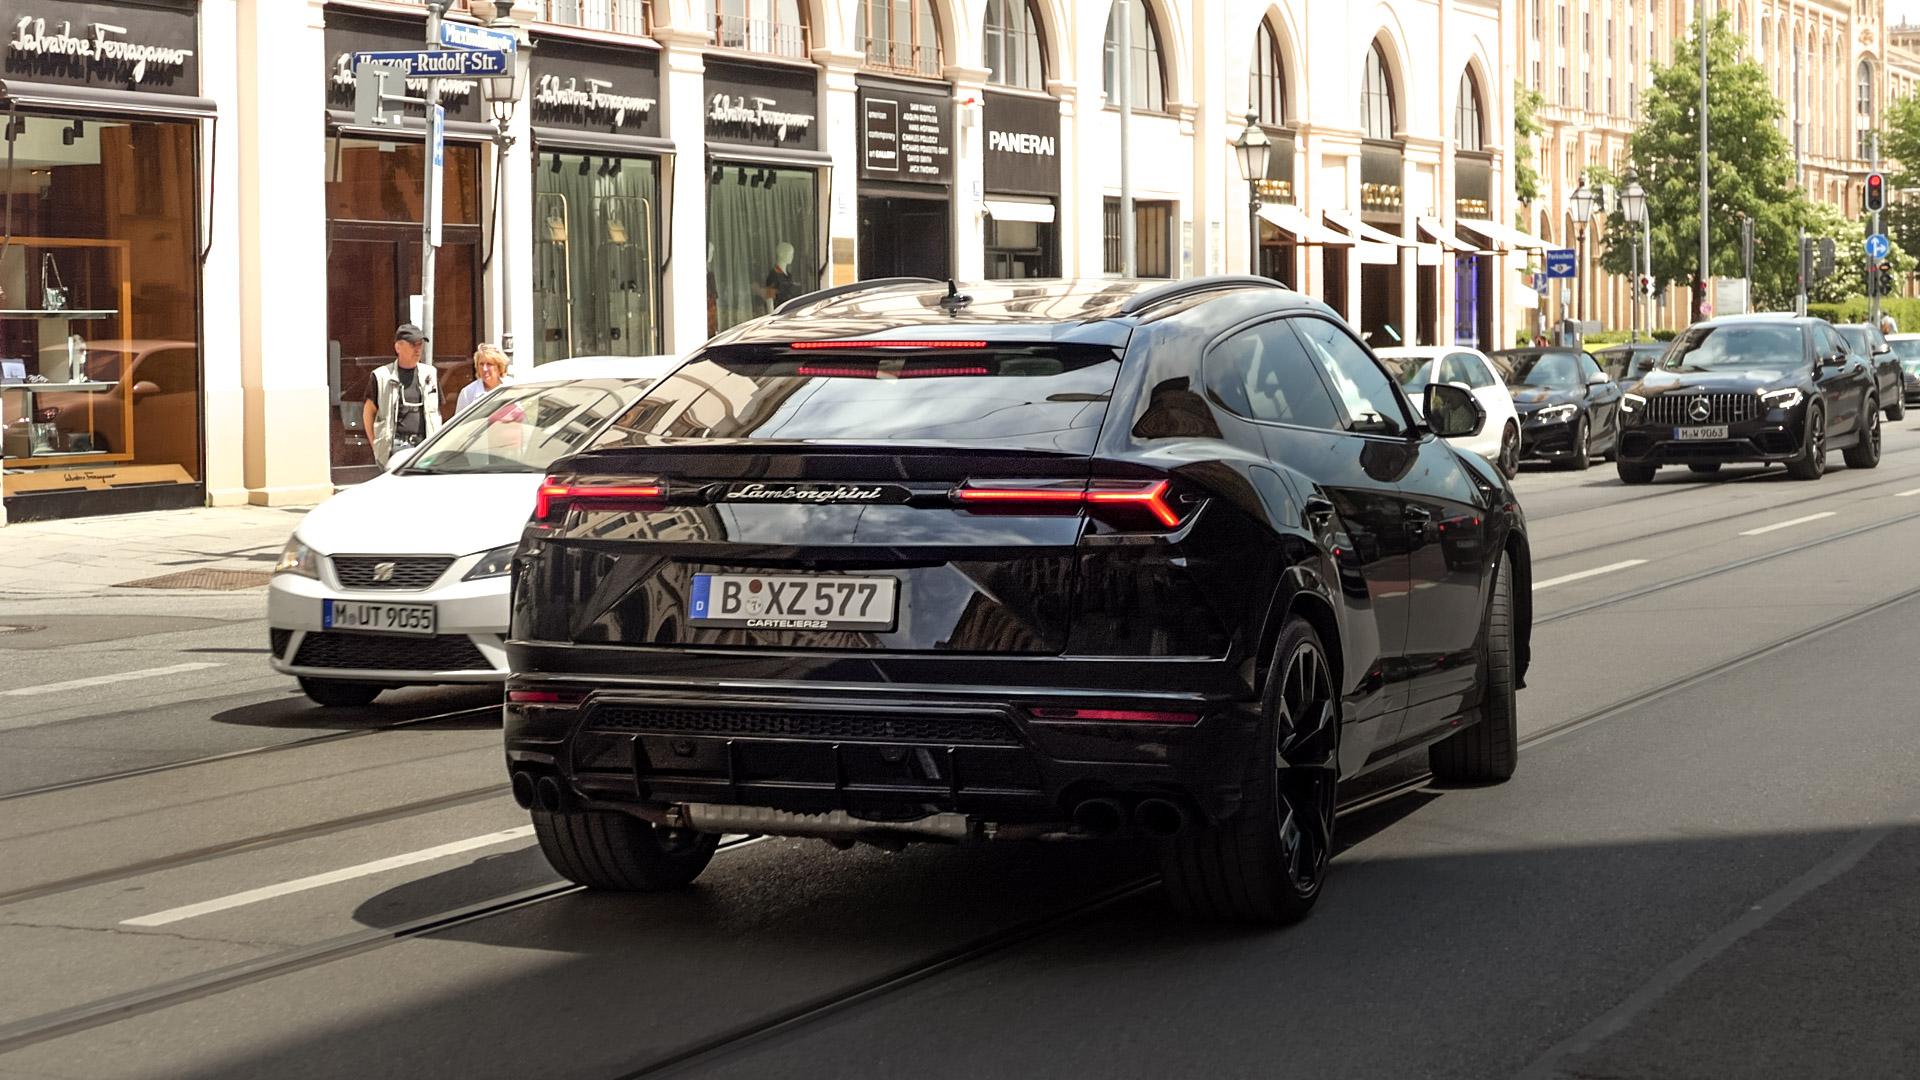 Lamborghini Urus - B-XZ-577